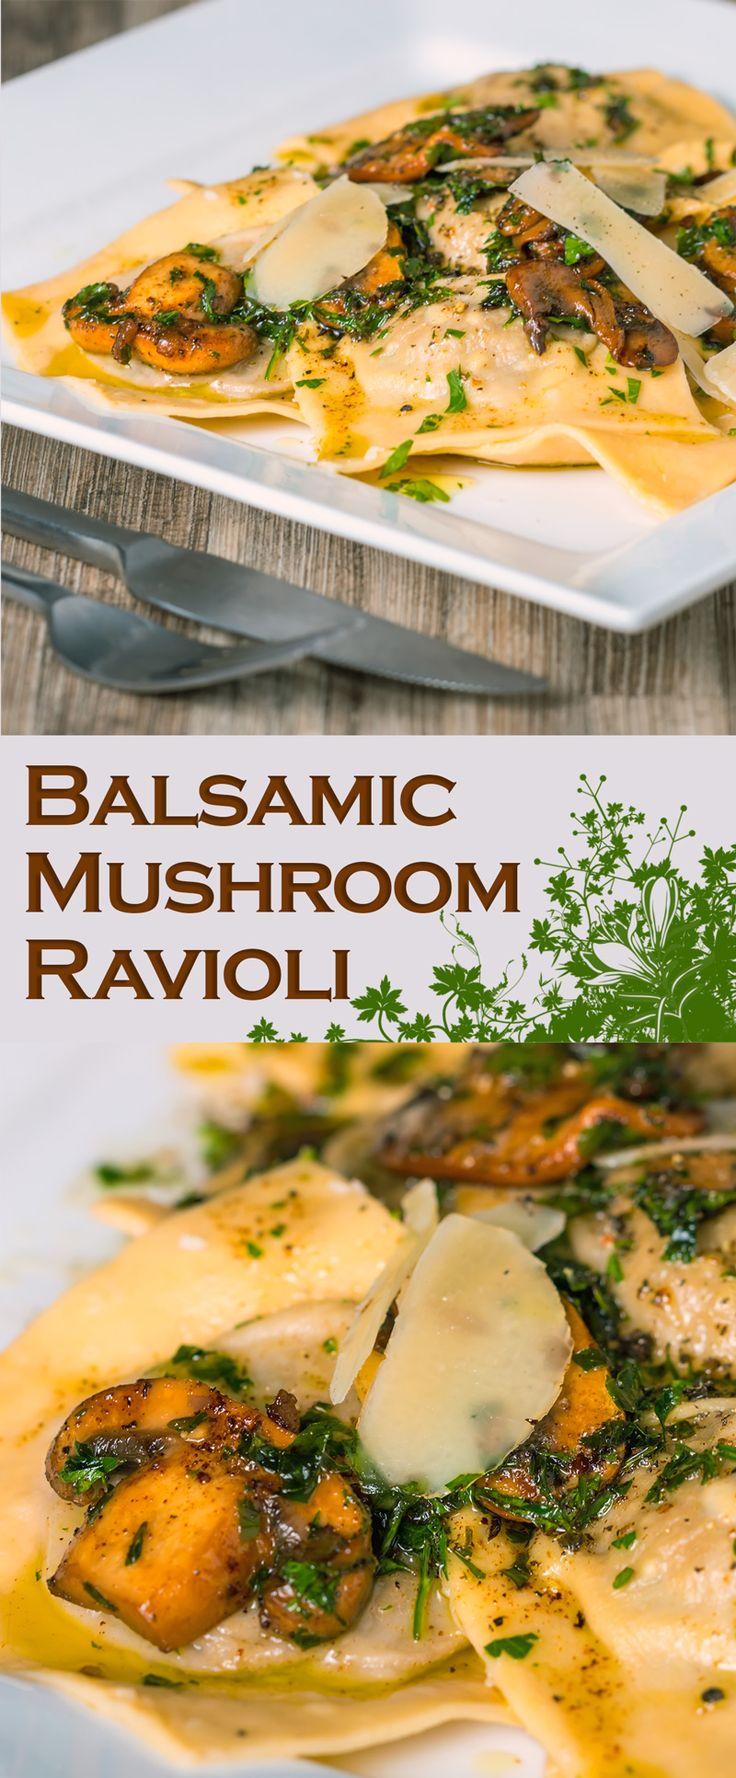 Balsamic and Garlic Mushroom Ravioli with butter sauce.